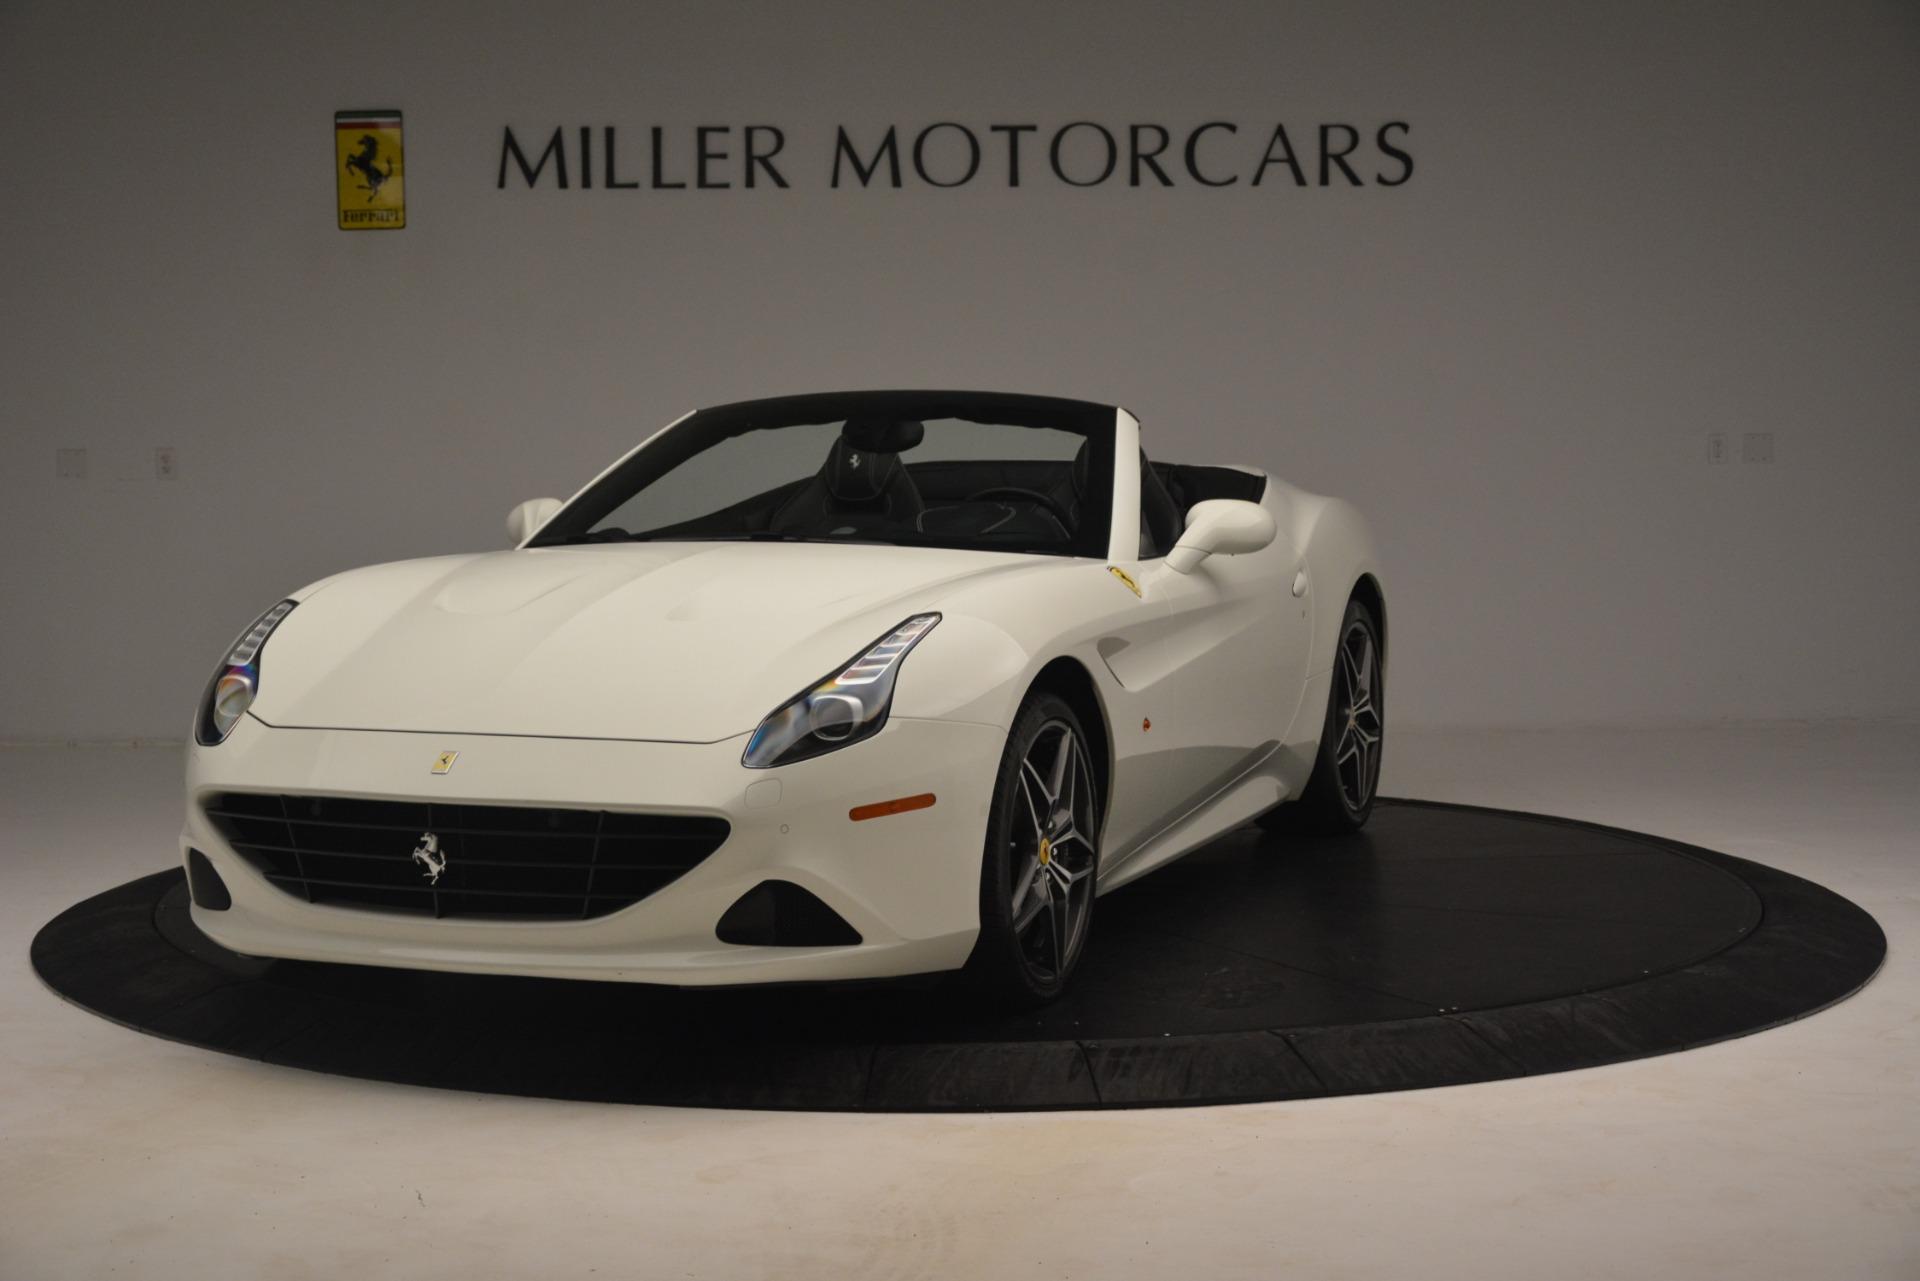 Used 2016 Ferrari California T for sale $141,900 at Alfa Romeo of Greenwich in Greenwich CT 06830 1